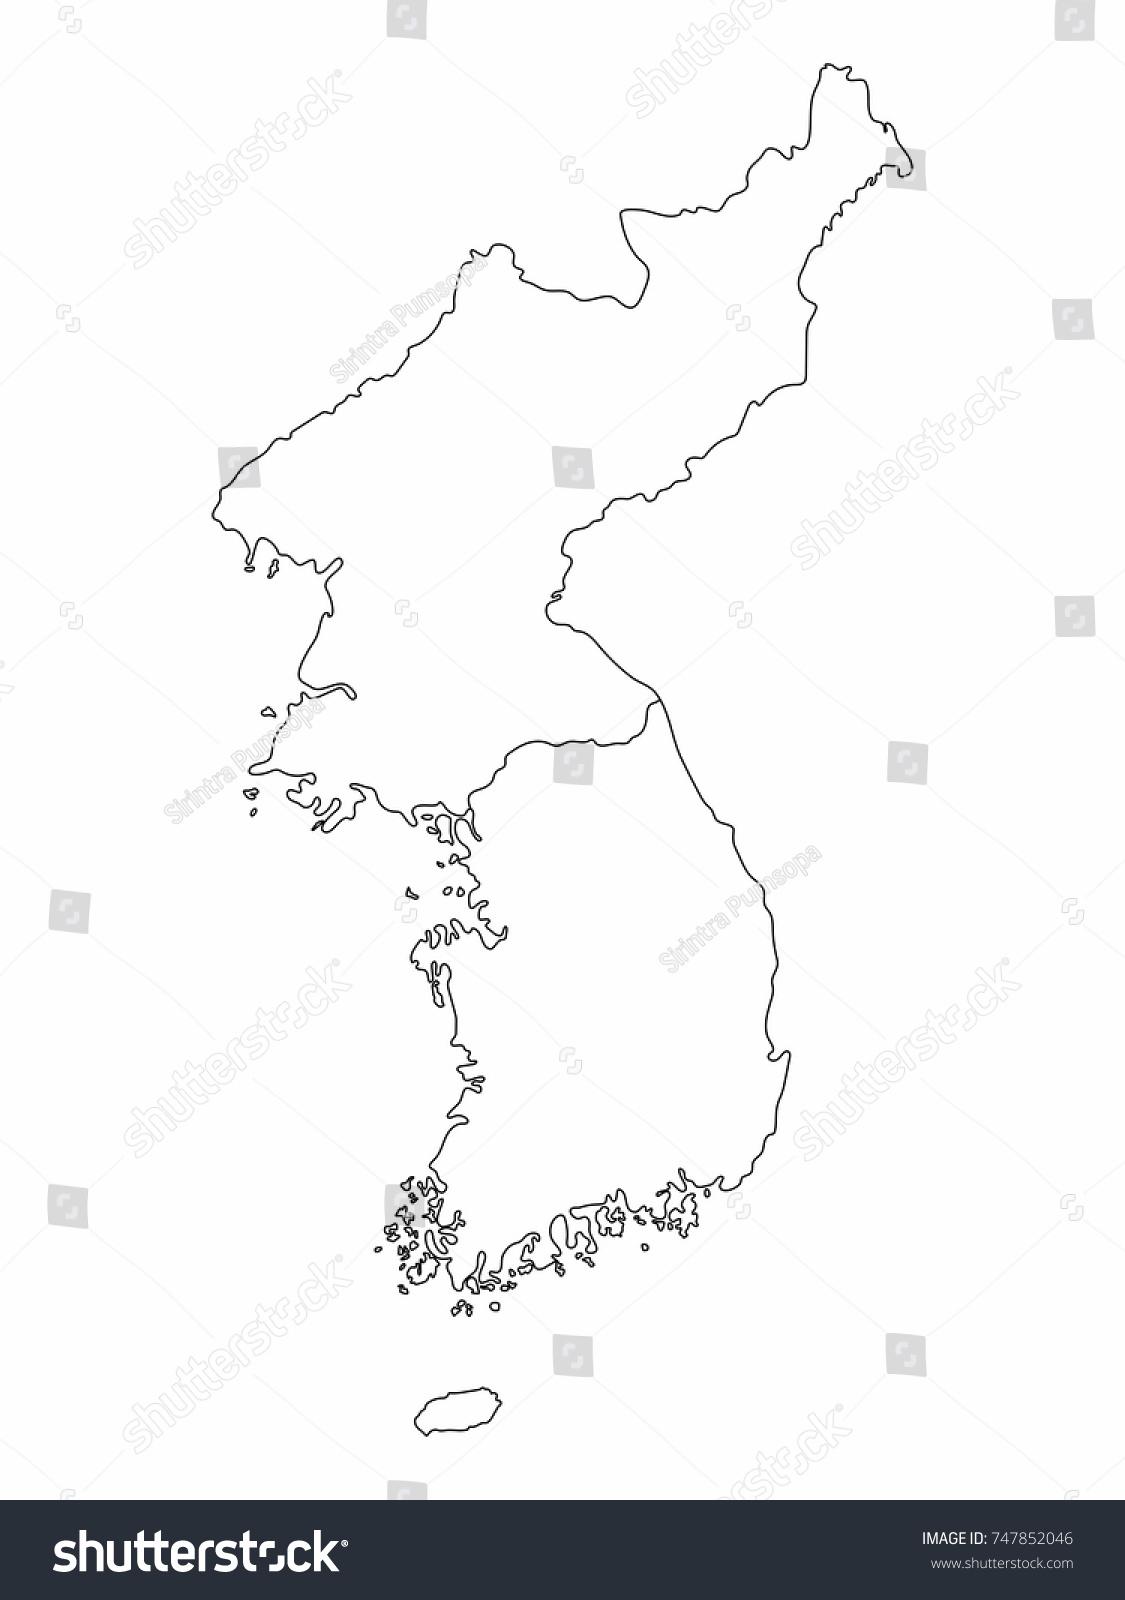 Vector De Stock Libre De Regalias Sobre North South Korea Map Outline Graphic747852046